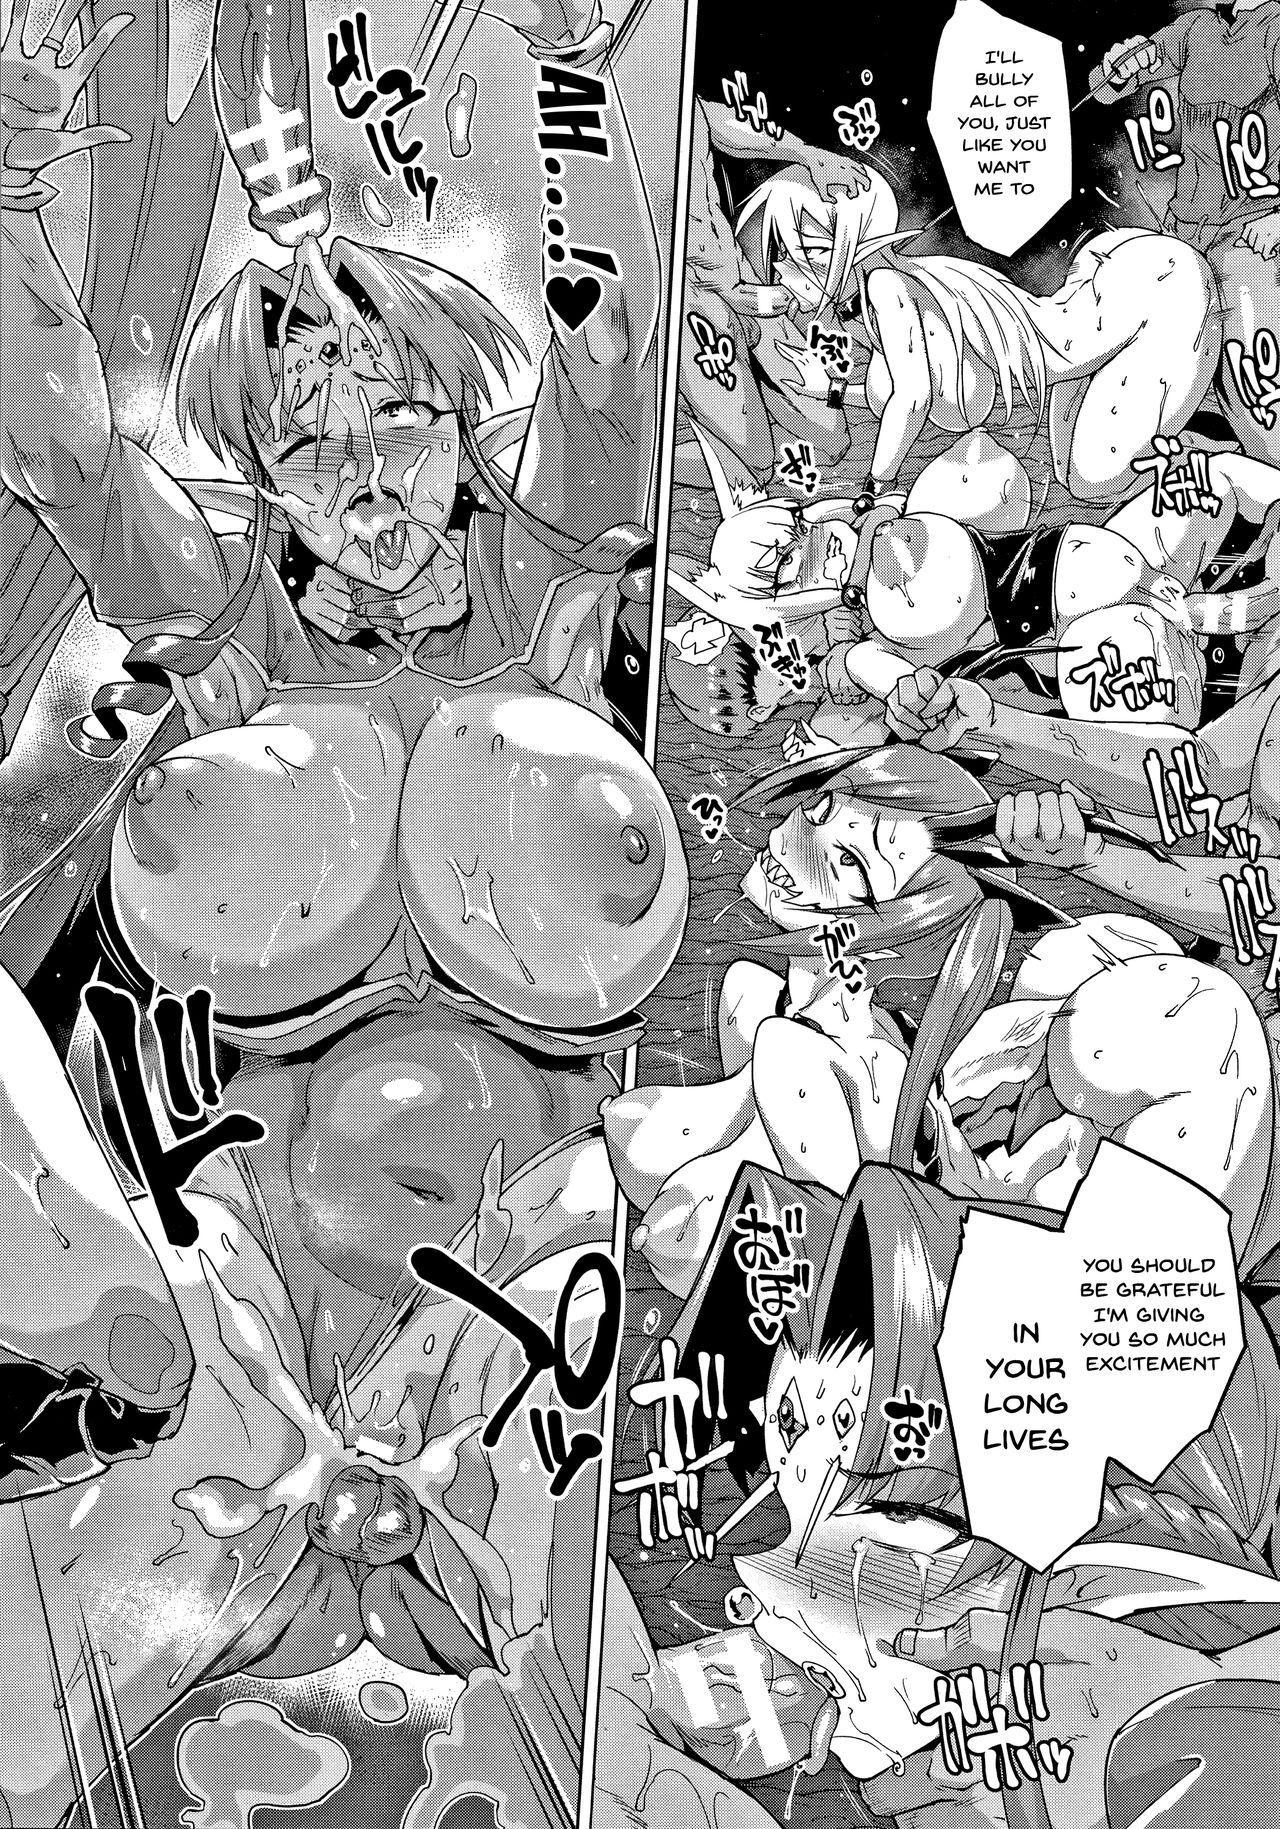 [Fan no Hitori] Sennen Reijou ~My Lady, My Master~  Ch.1-6 [English] {Doujins.com} 120